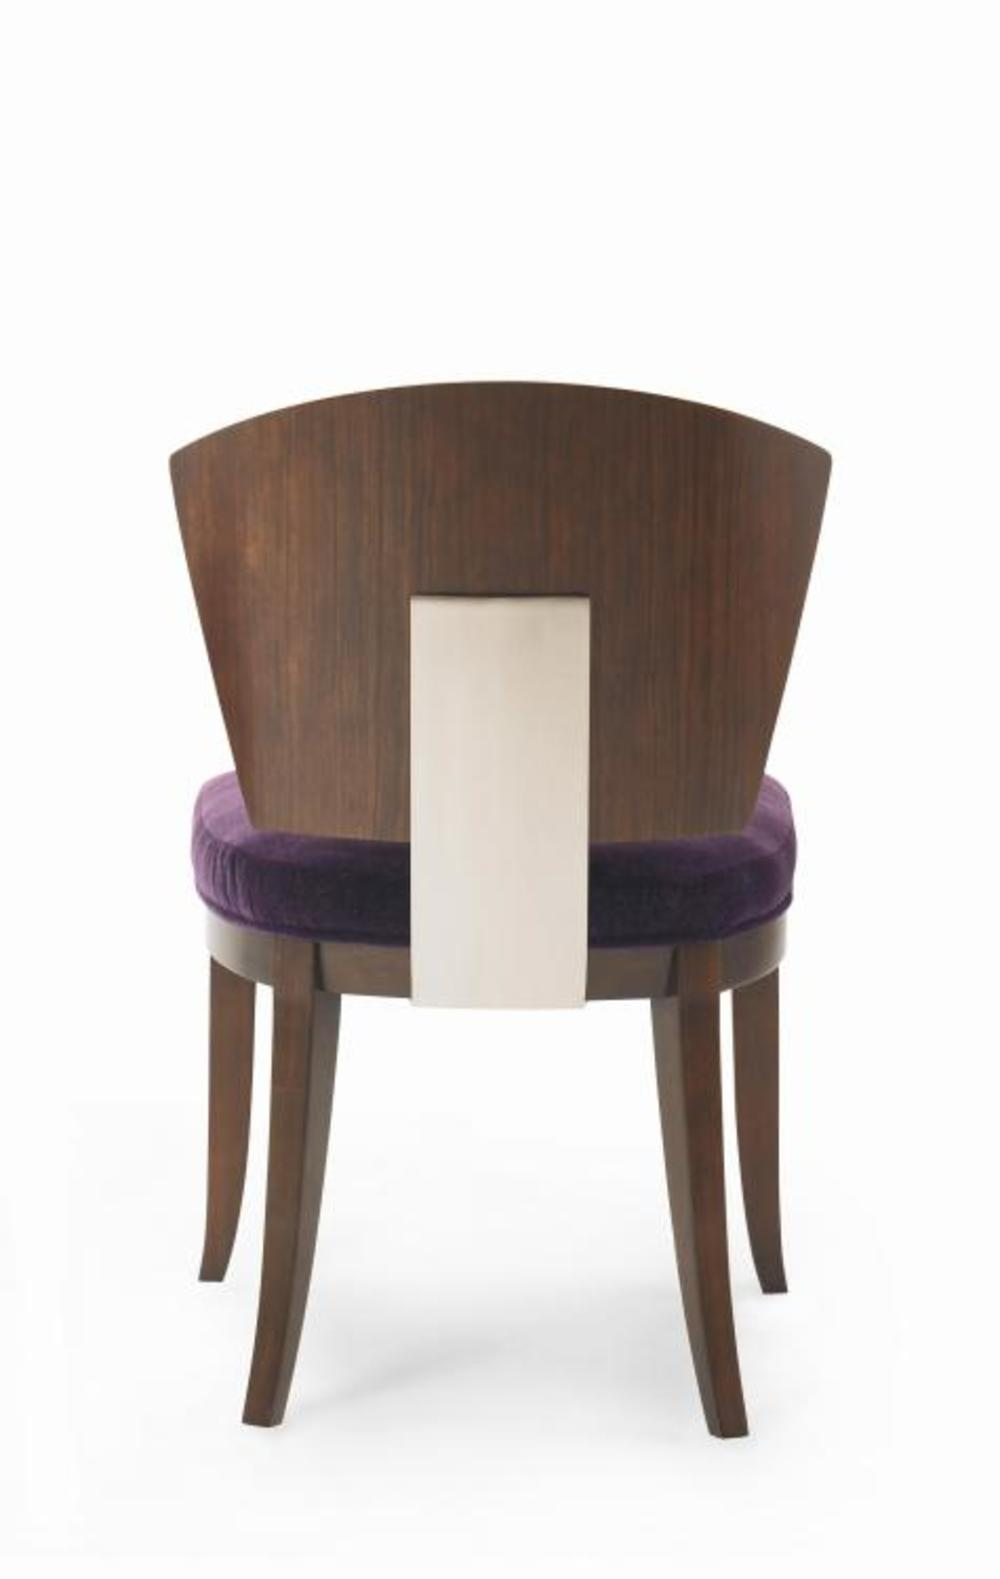 CENTURY FURNITURE - Paragon Club Slipstream Dining Chair